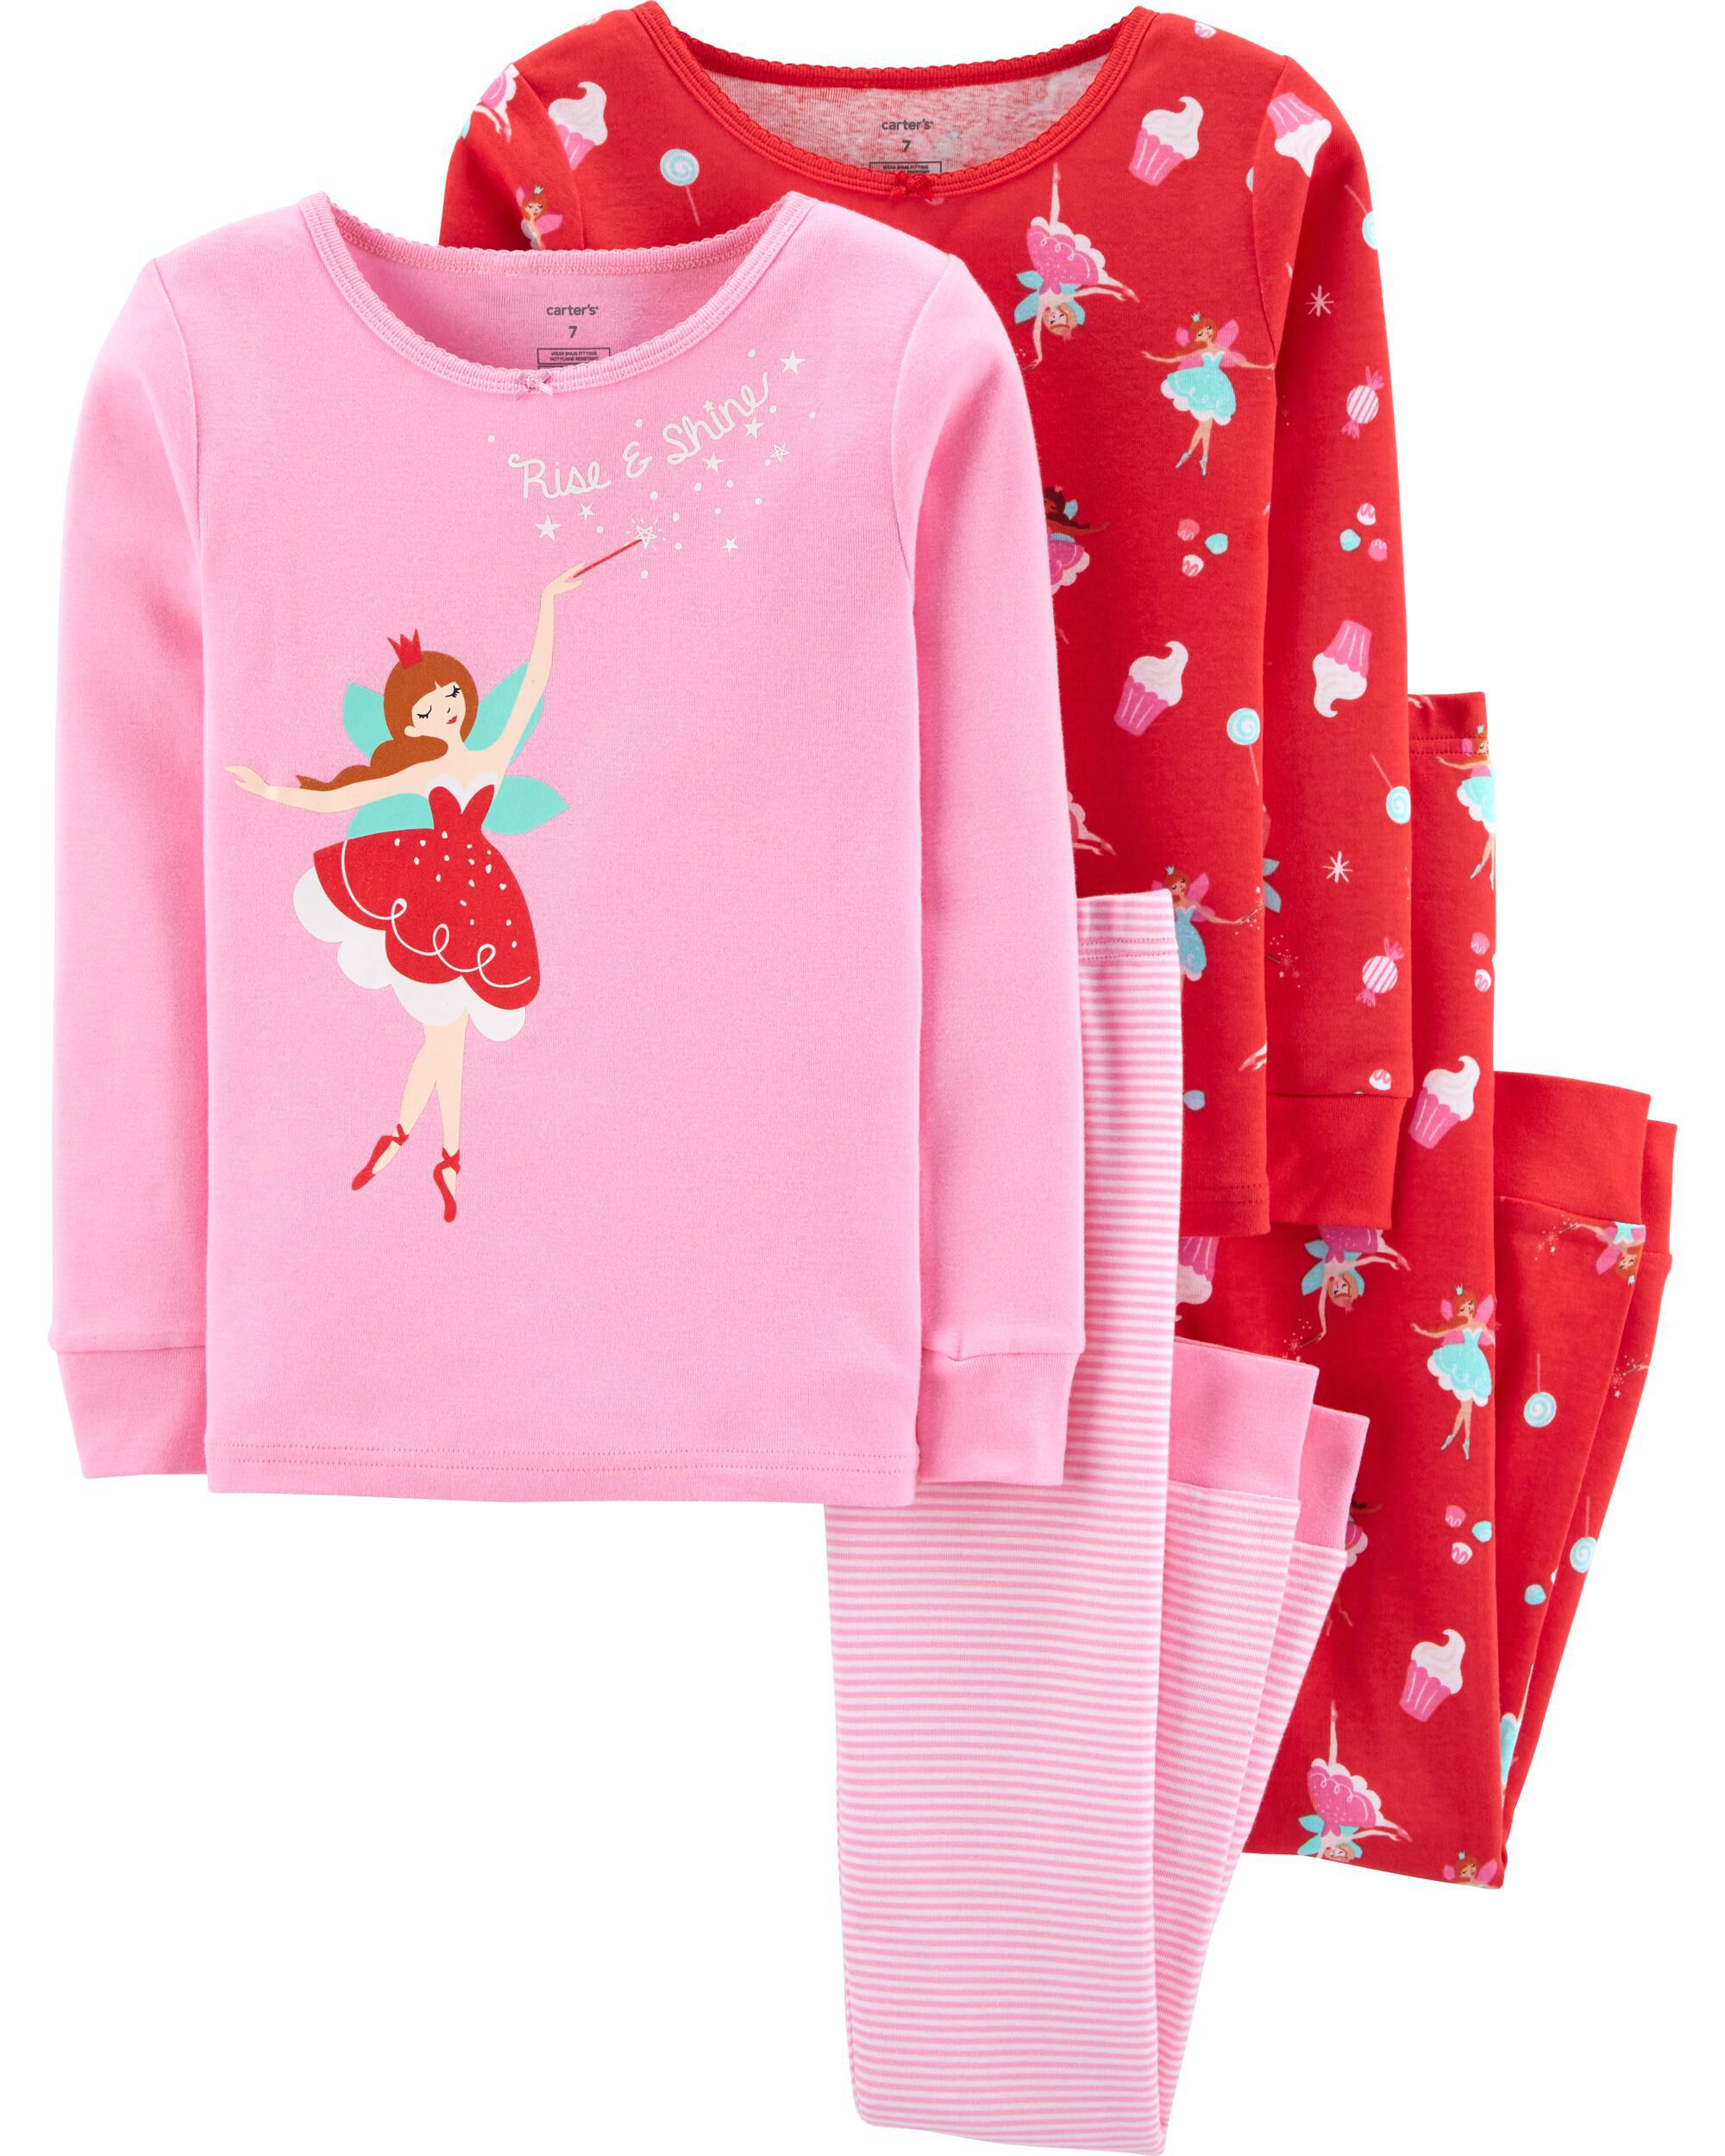 $142 Carter's Toddler Girl Lot Of Five Long Sleeve Tops Sweatshirts Sz 4T MSRP